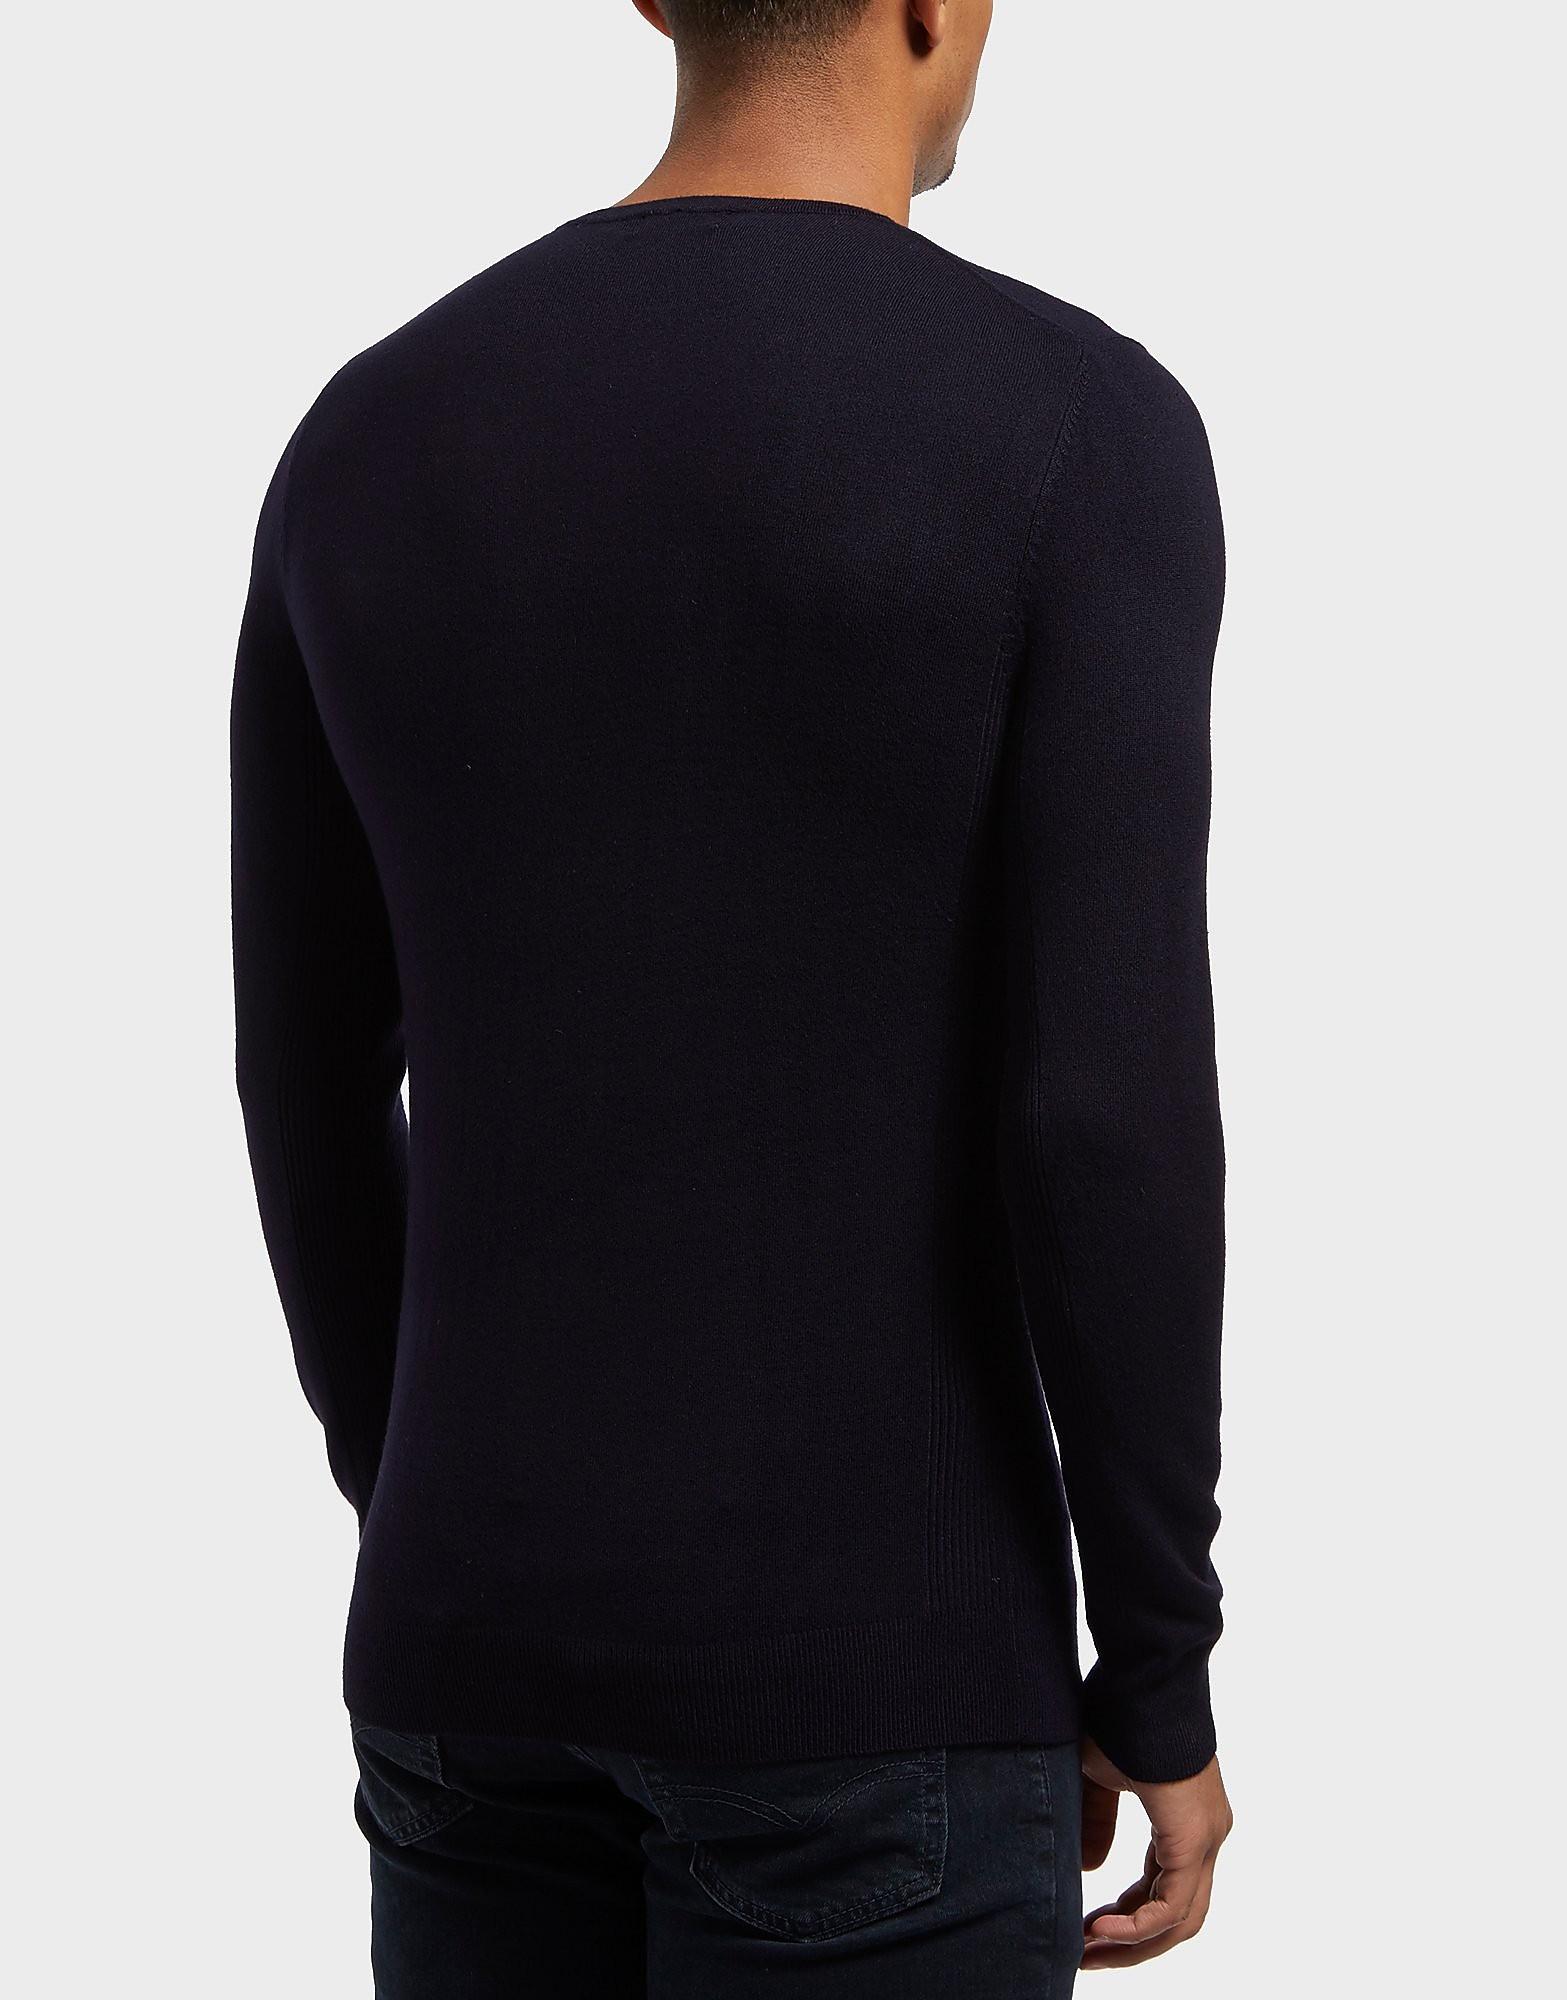 Antony Morato Plaque Knitted Jumper